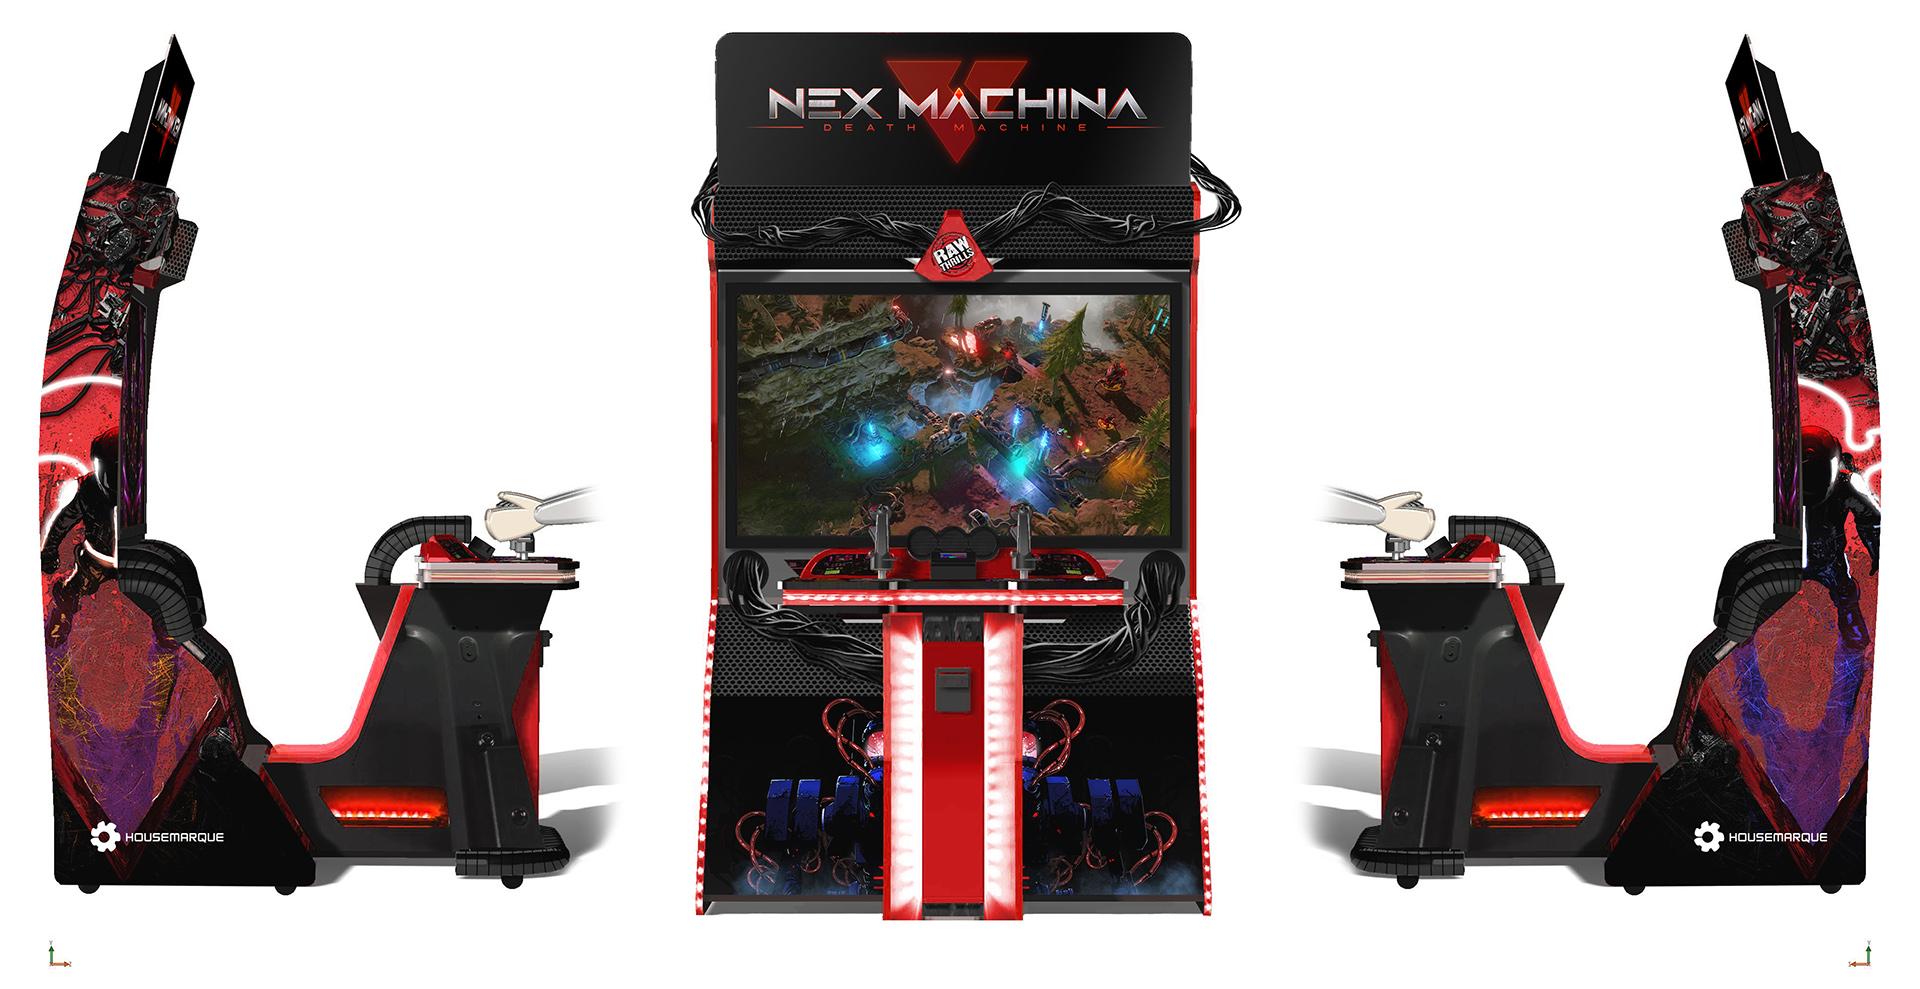 Nex_ArcadeCabinet_merged_M.jpg